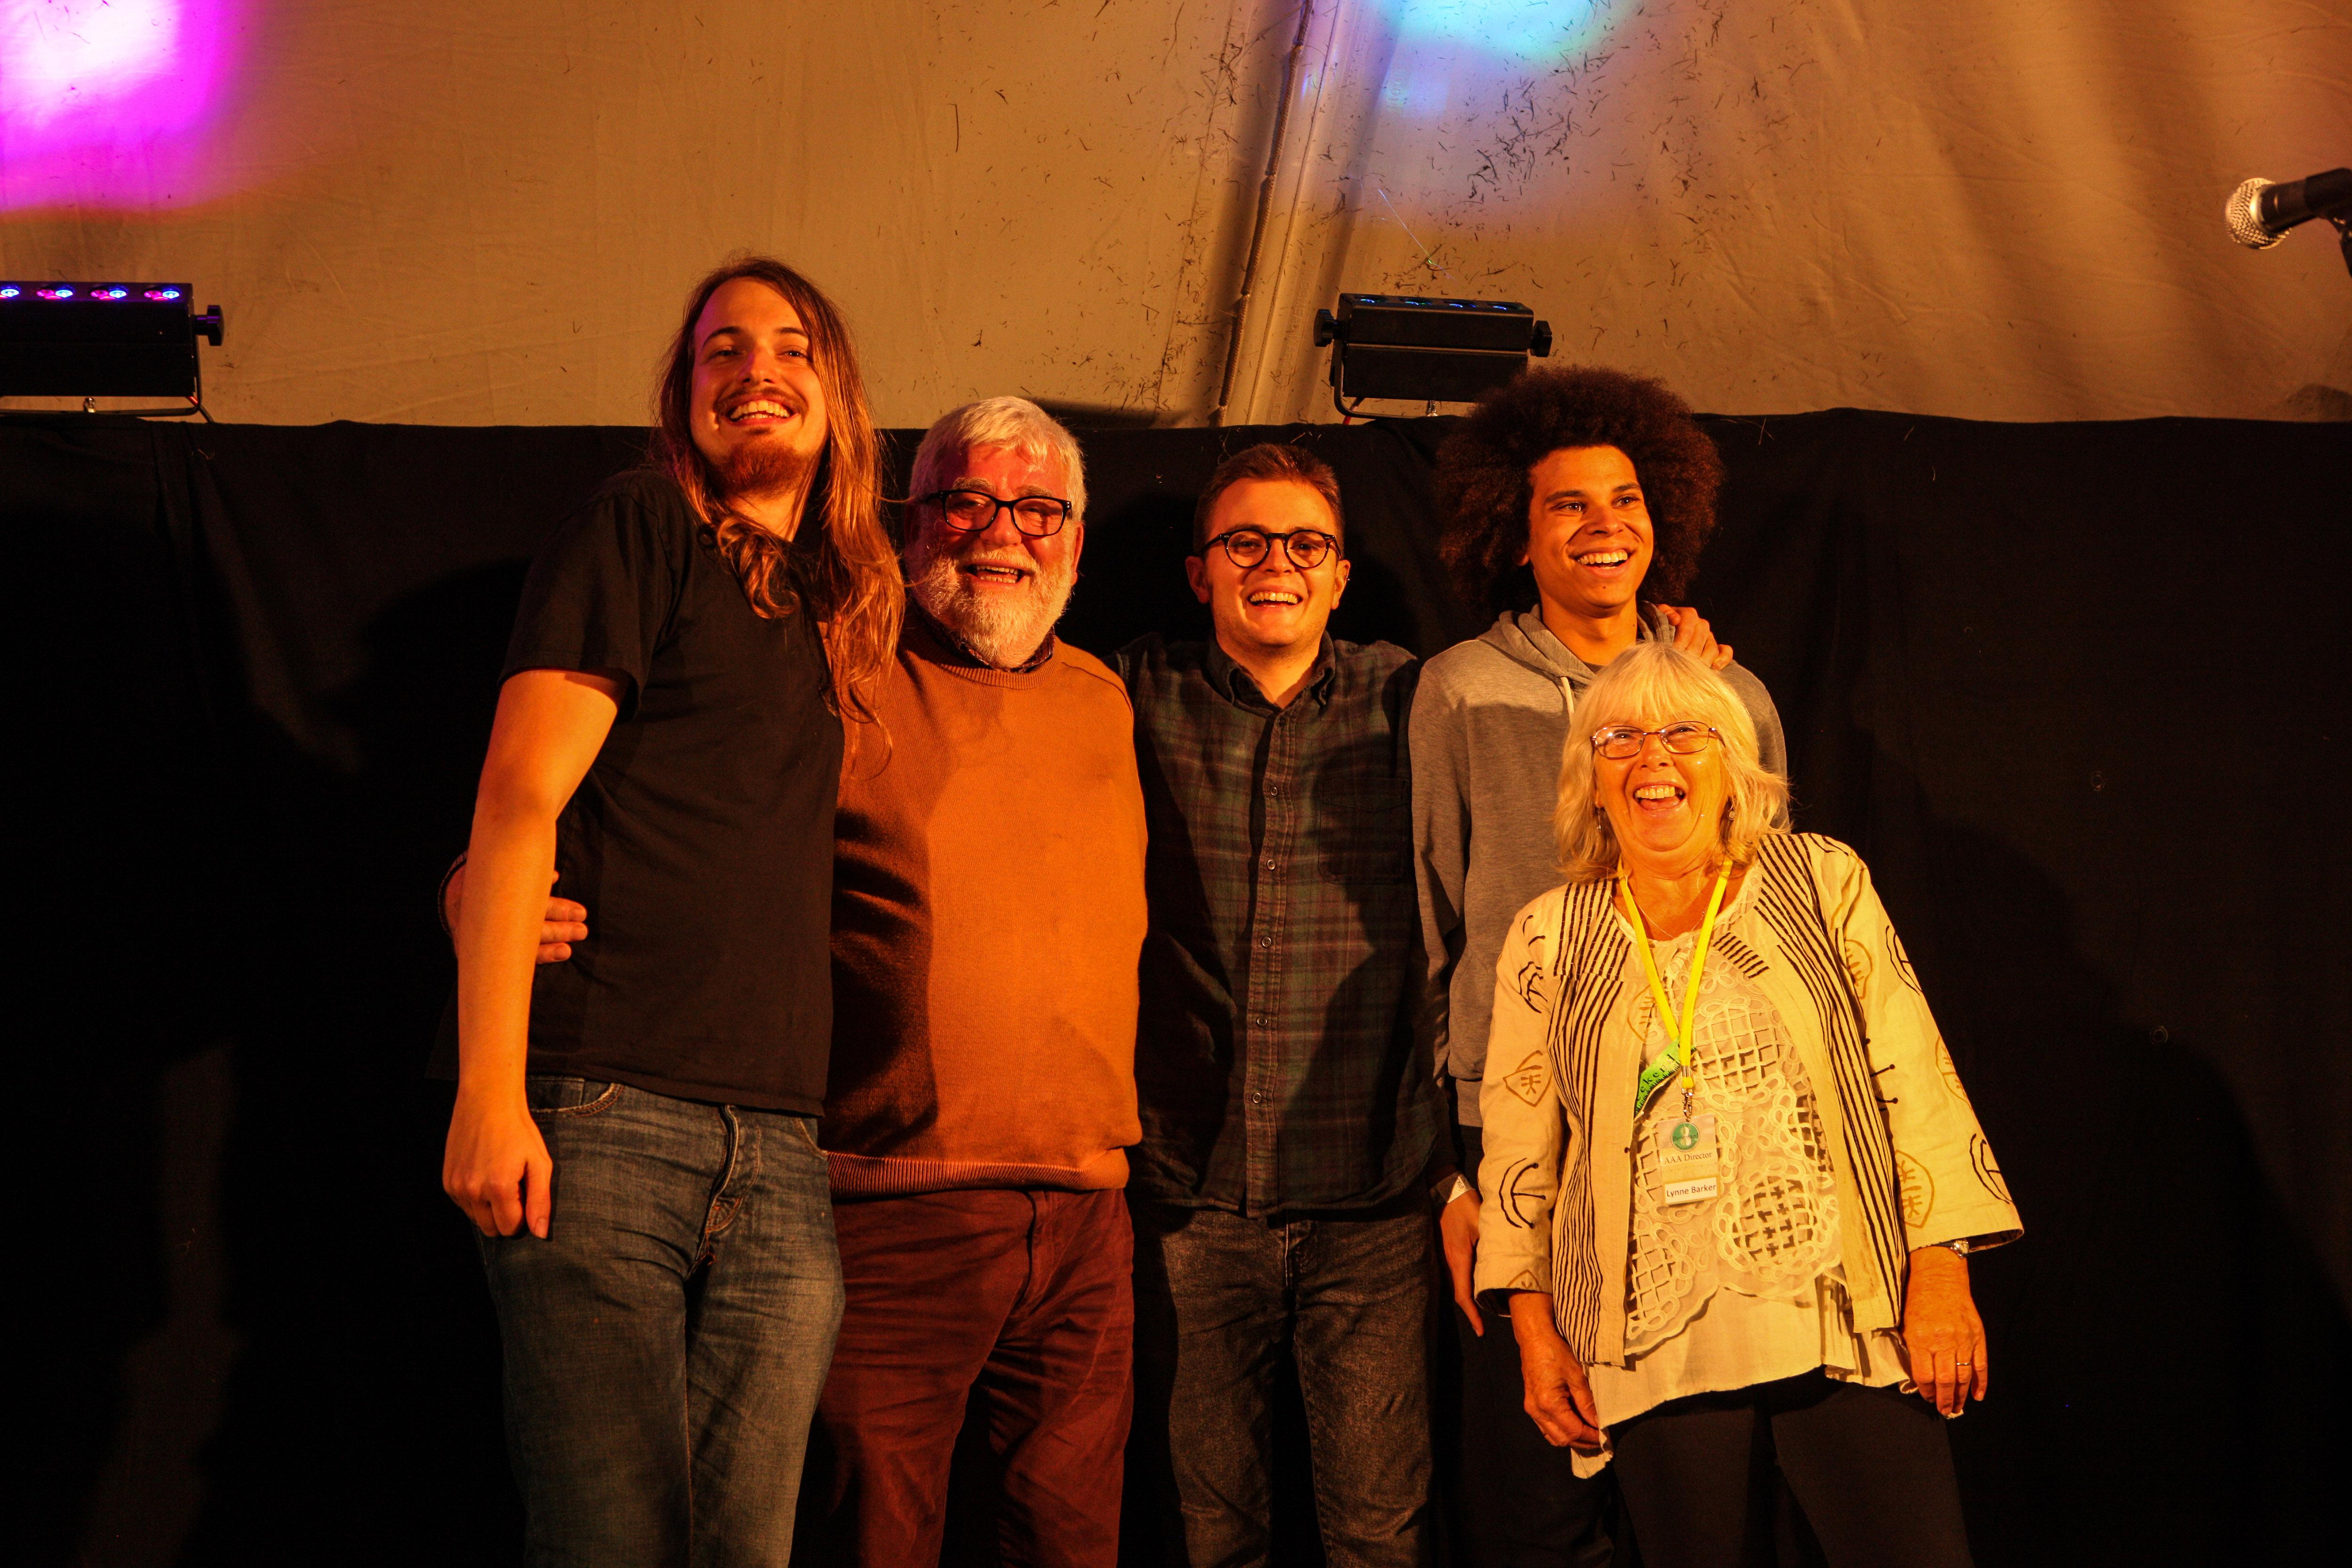 Lewis Wood, Dick Dixon (BFF), George Sansome, Cohen Braithwaite-Kilcoyne and Lynne Barker (BFF)